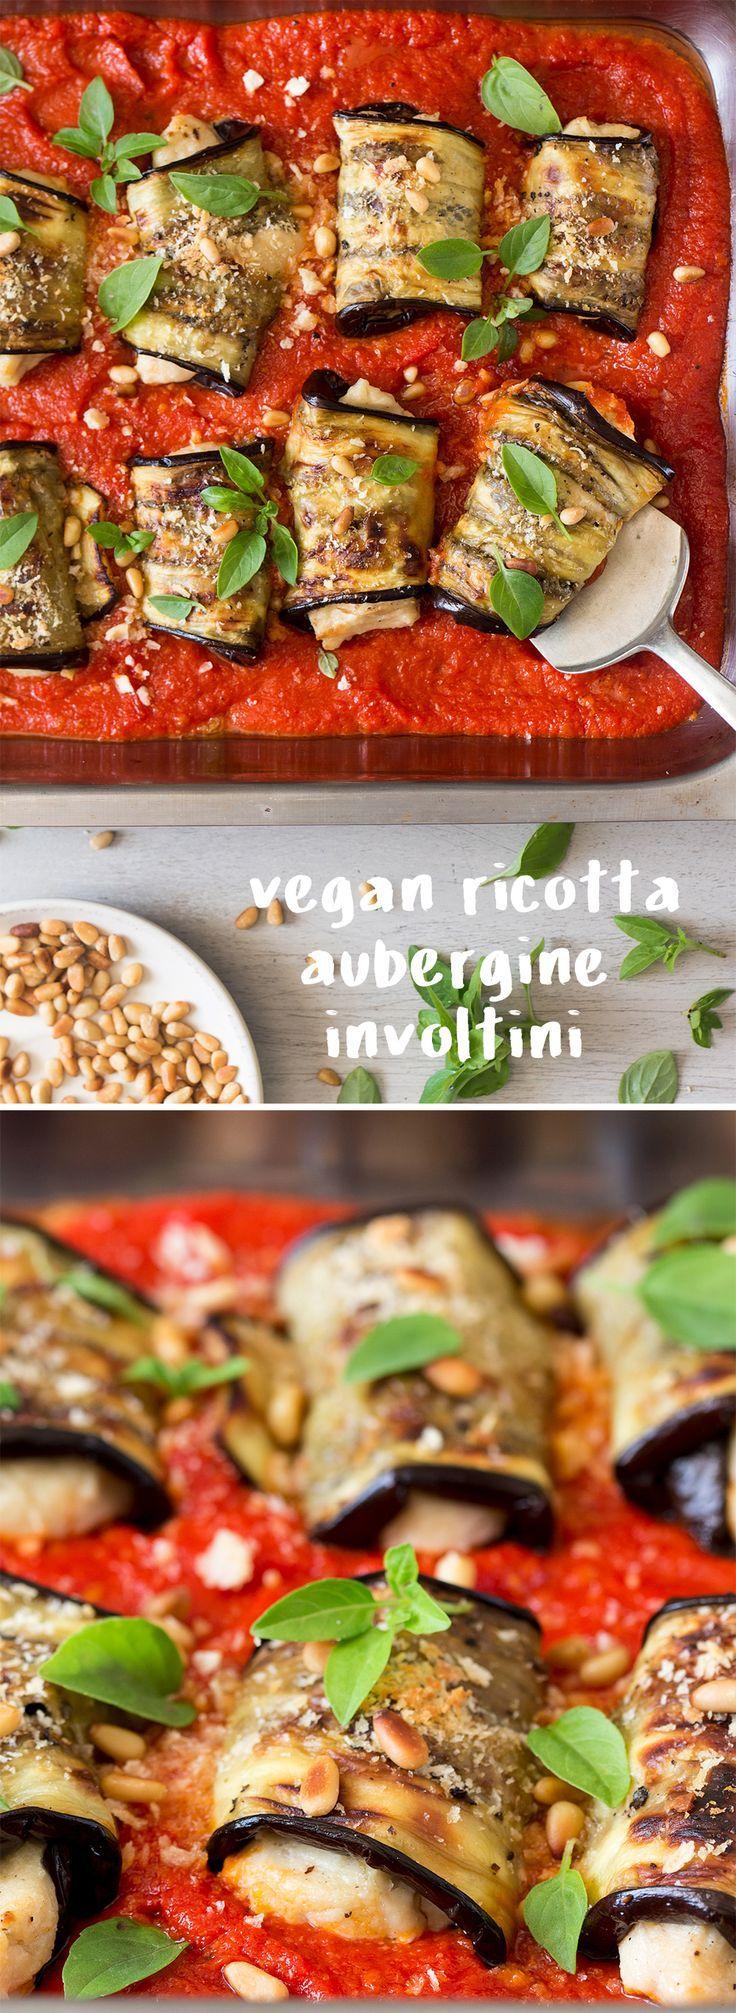 Aubergine involtini with vegan ricotta